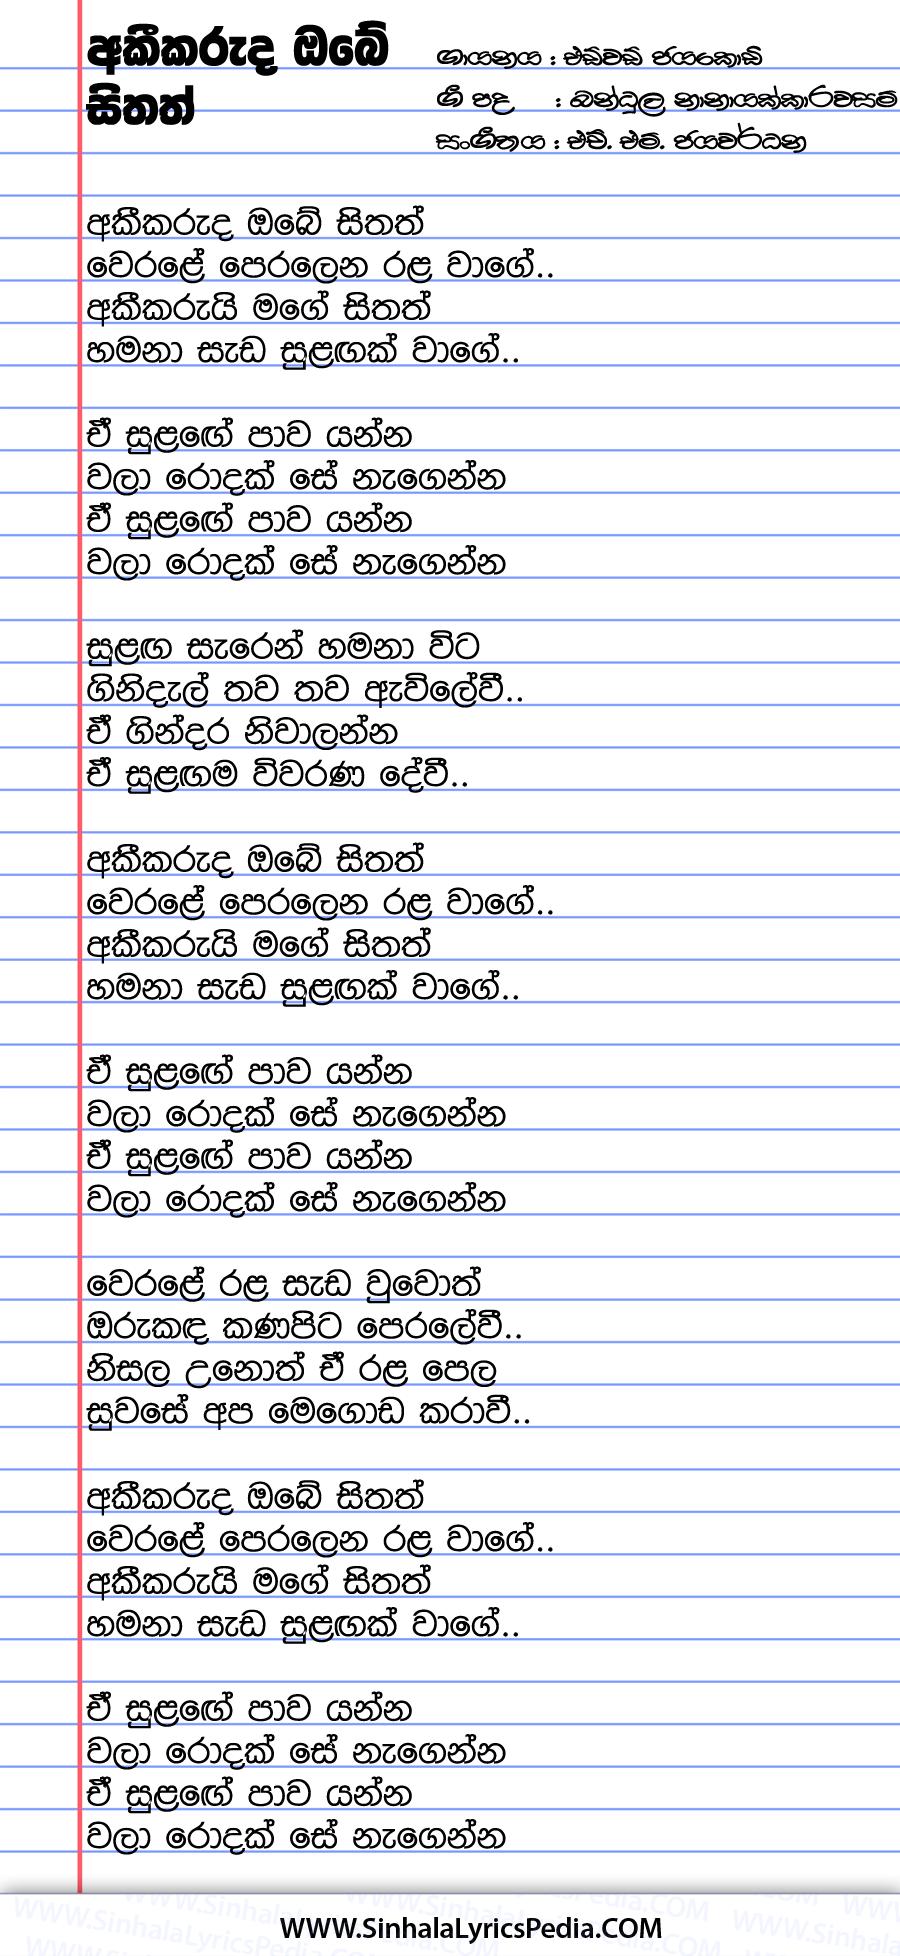 Akikaruda Obe Sithath Werale Peralena Rala Wage Song Lyrics